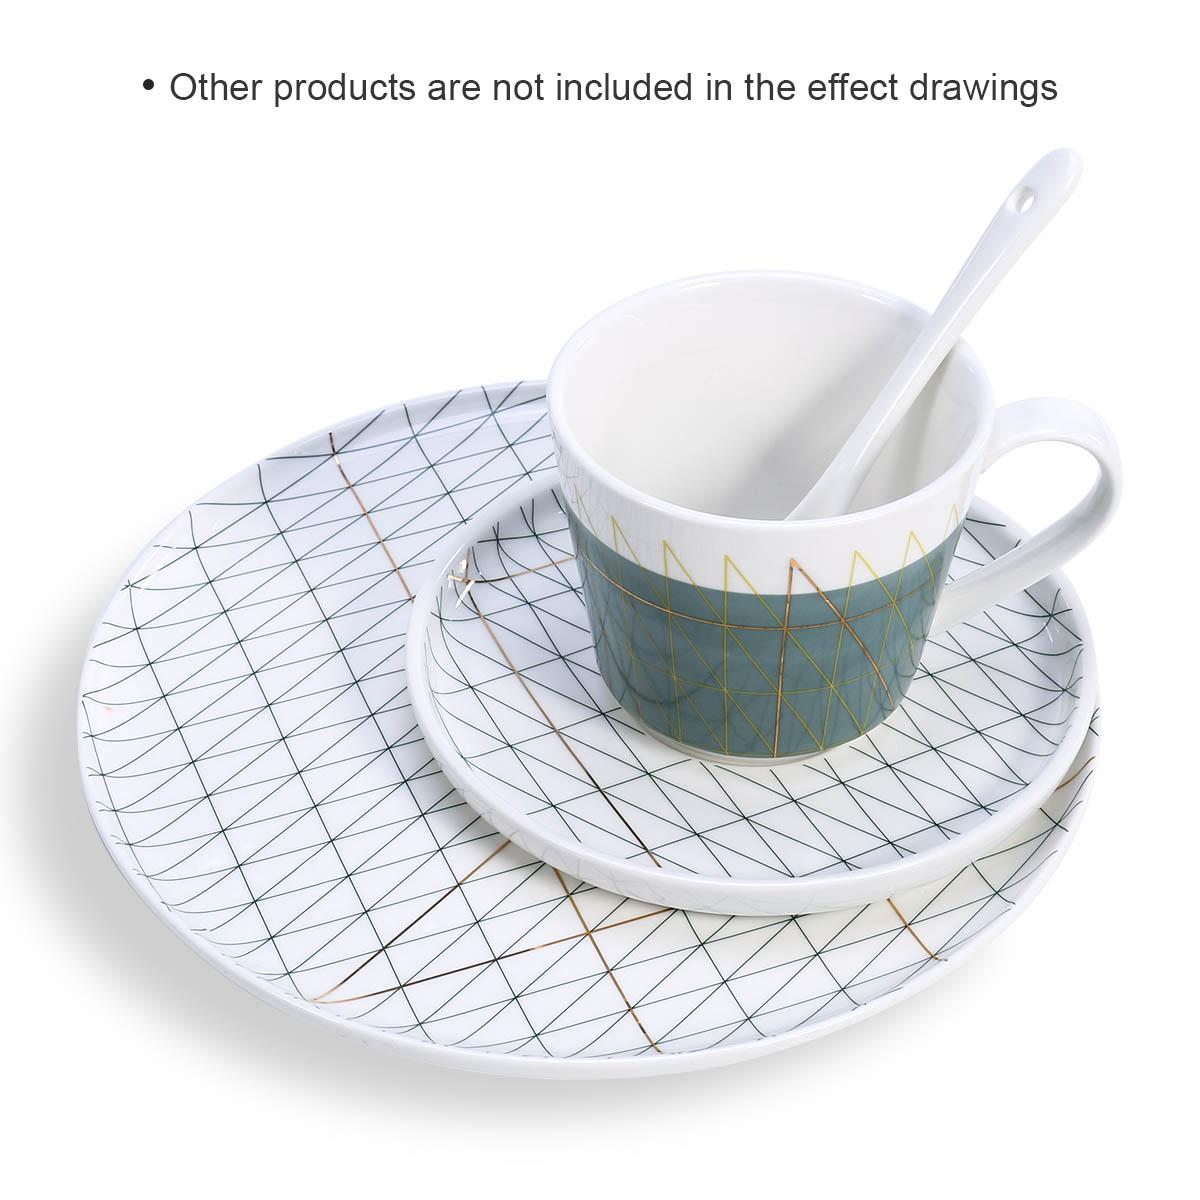 Best and cheap white Ceramic Plate Livingware Dinner Serving Plate  Porcelain Dishes Microwave Safe Dishwasher Safe Plate - Tooarts com